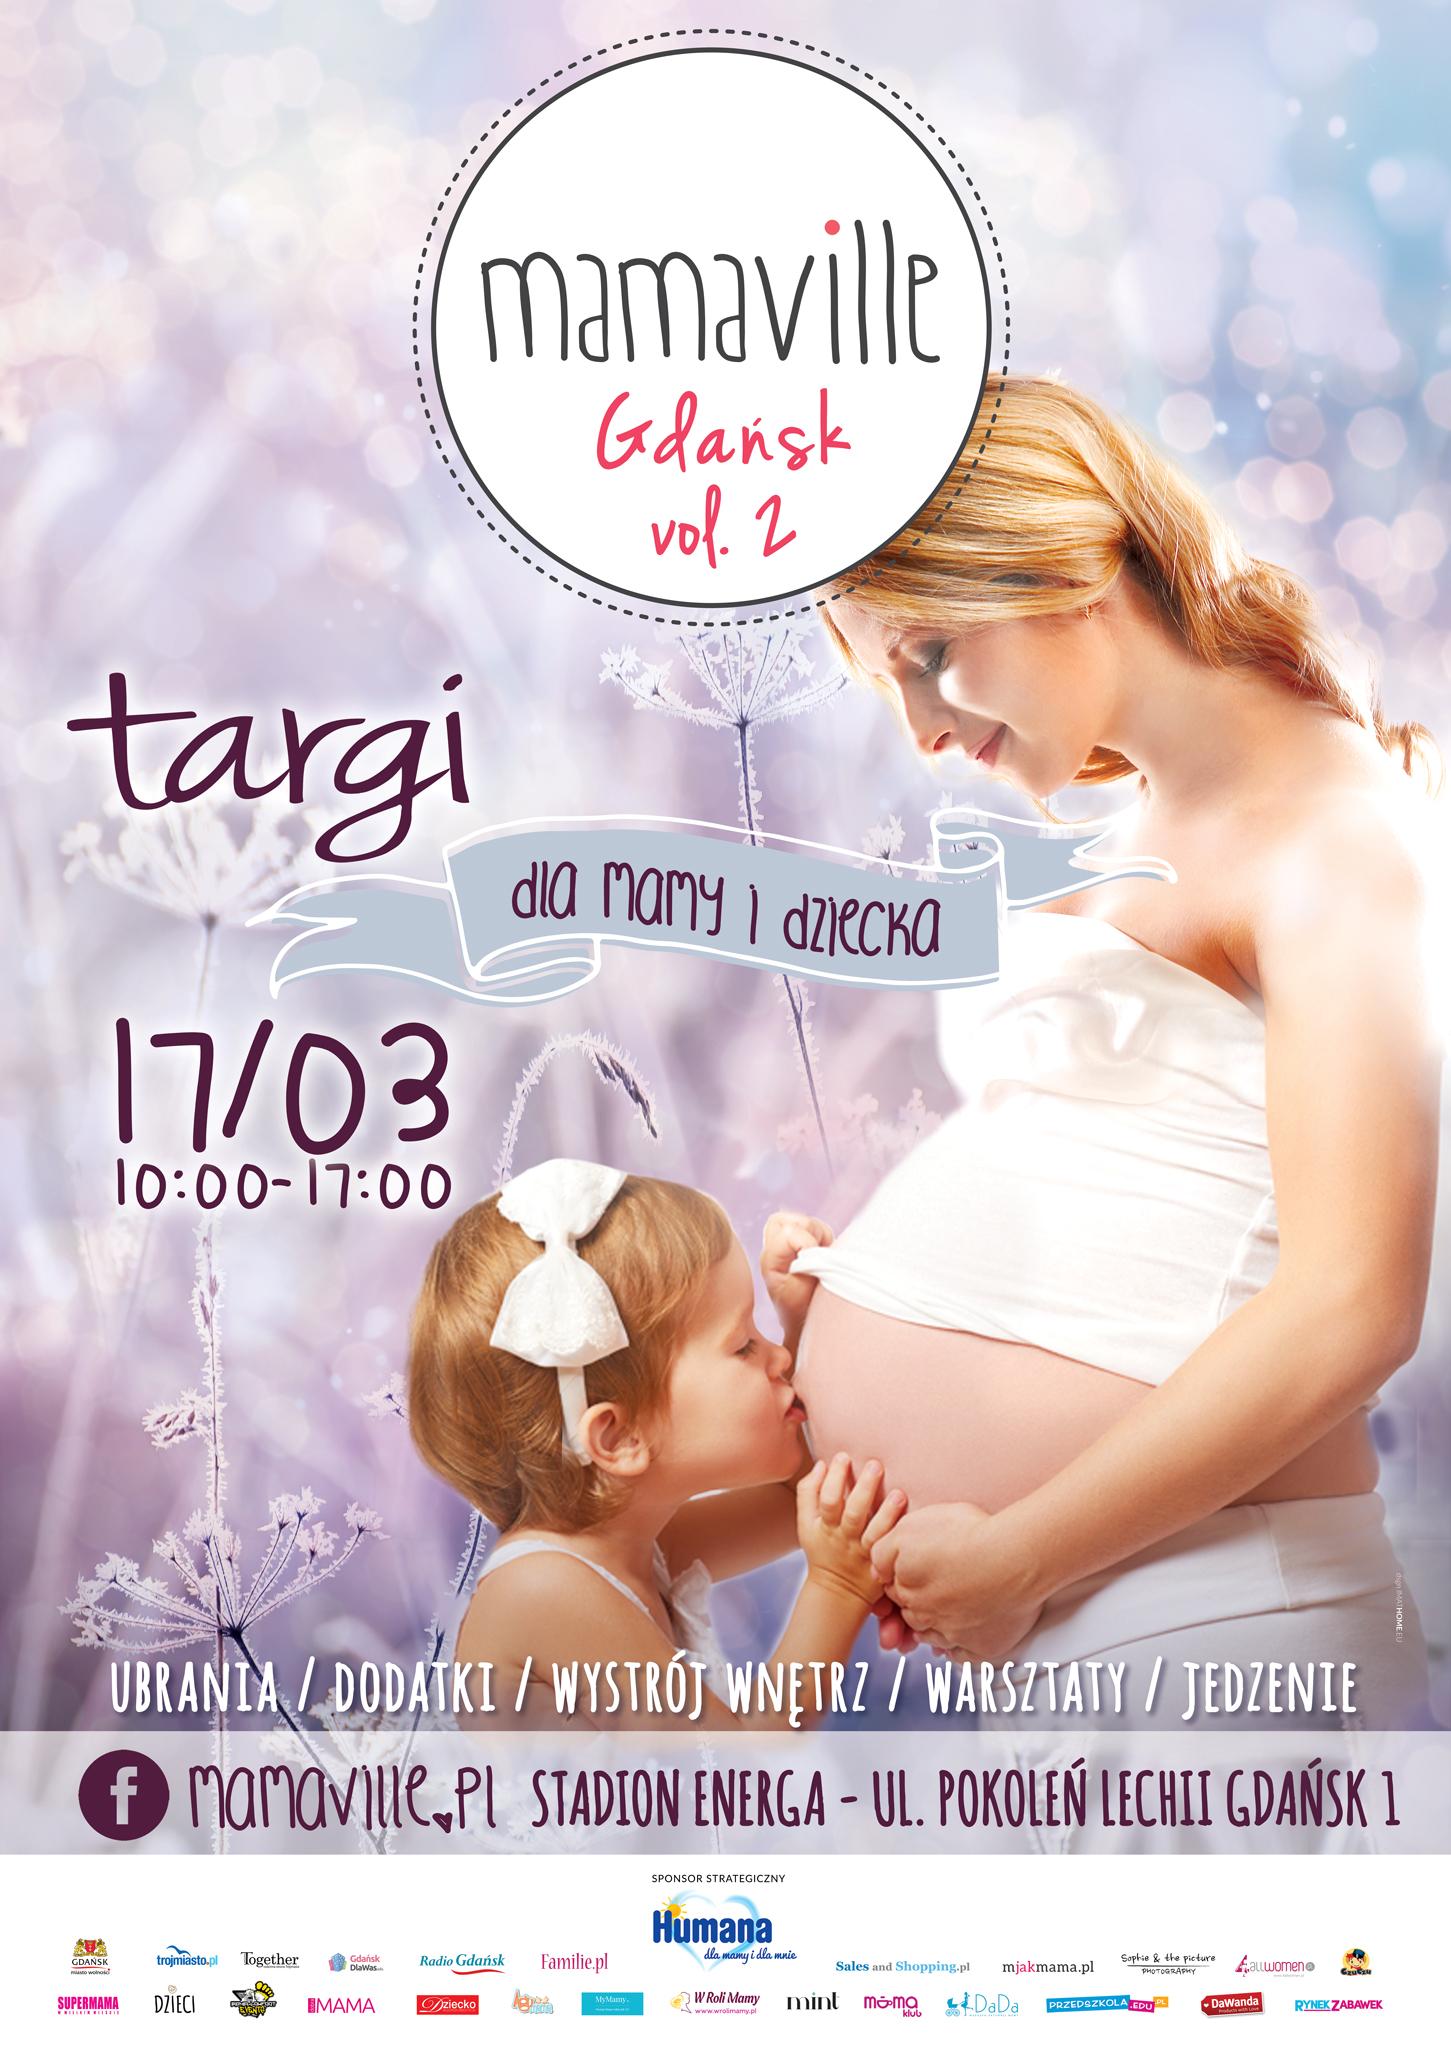 Targi Mamaville w Gdańsku 17 marca 2018                         title=